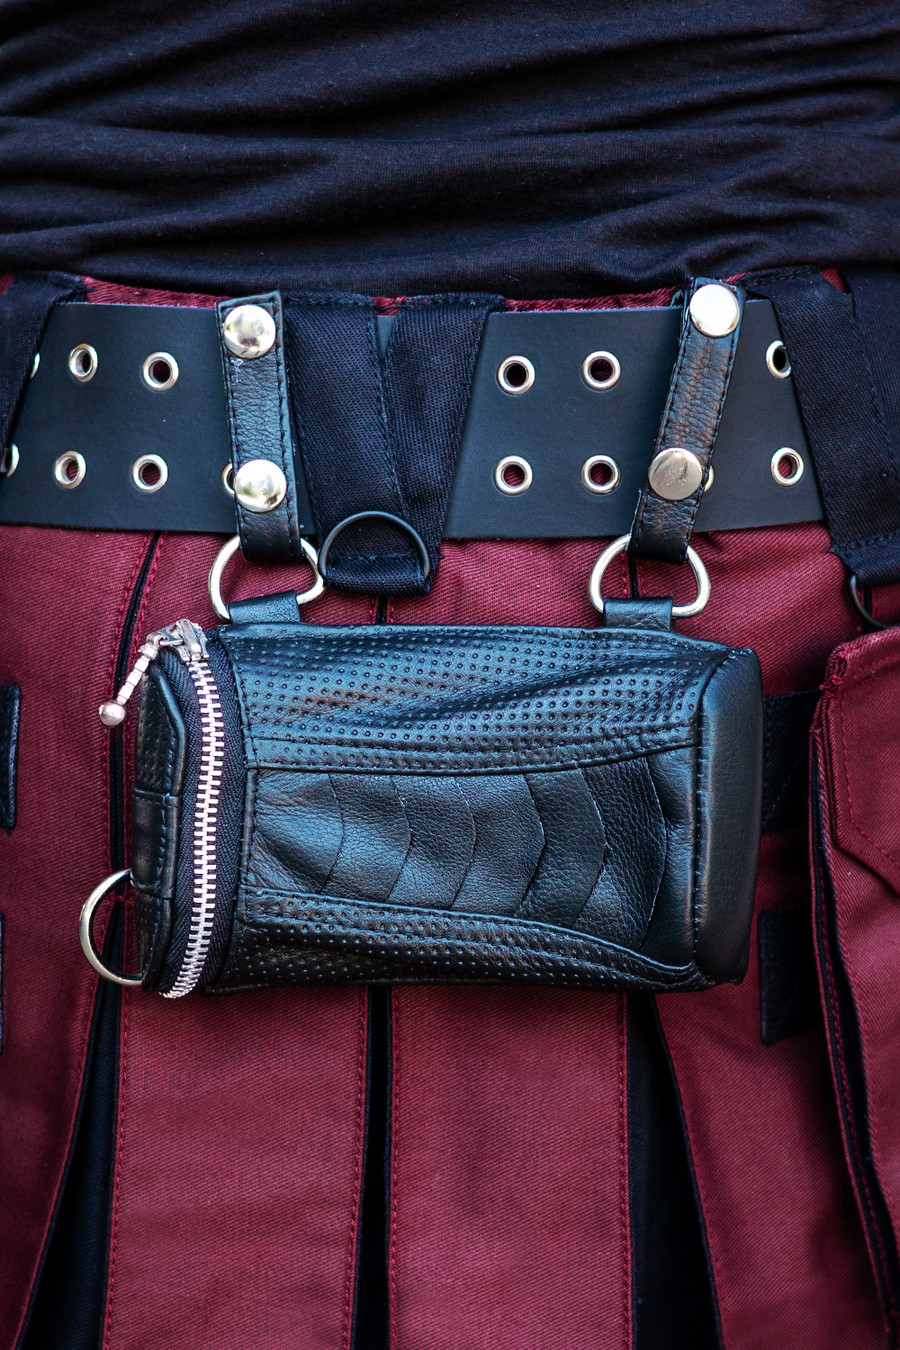 Wallet Pocket with silver details attached to Sellsword Kilt Belt